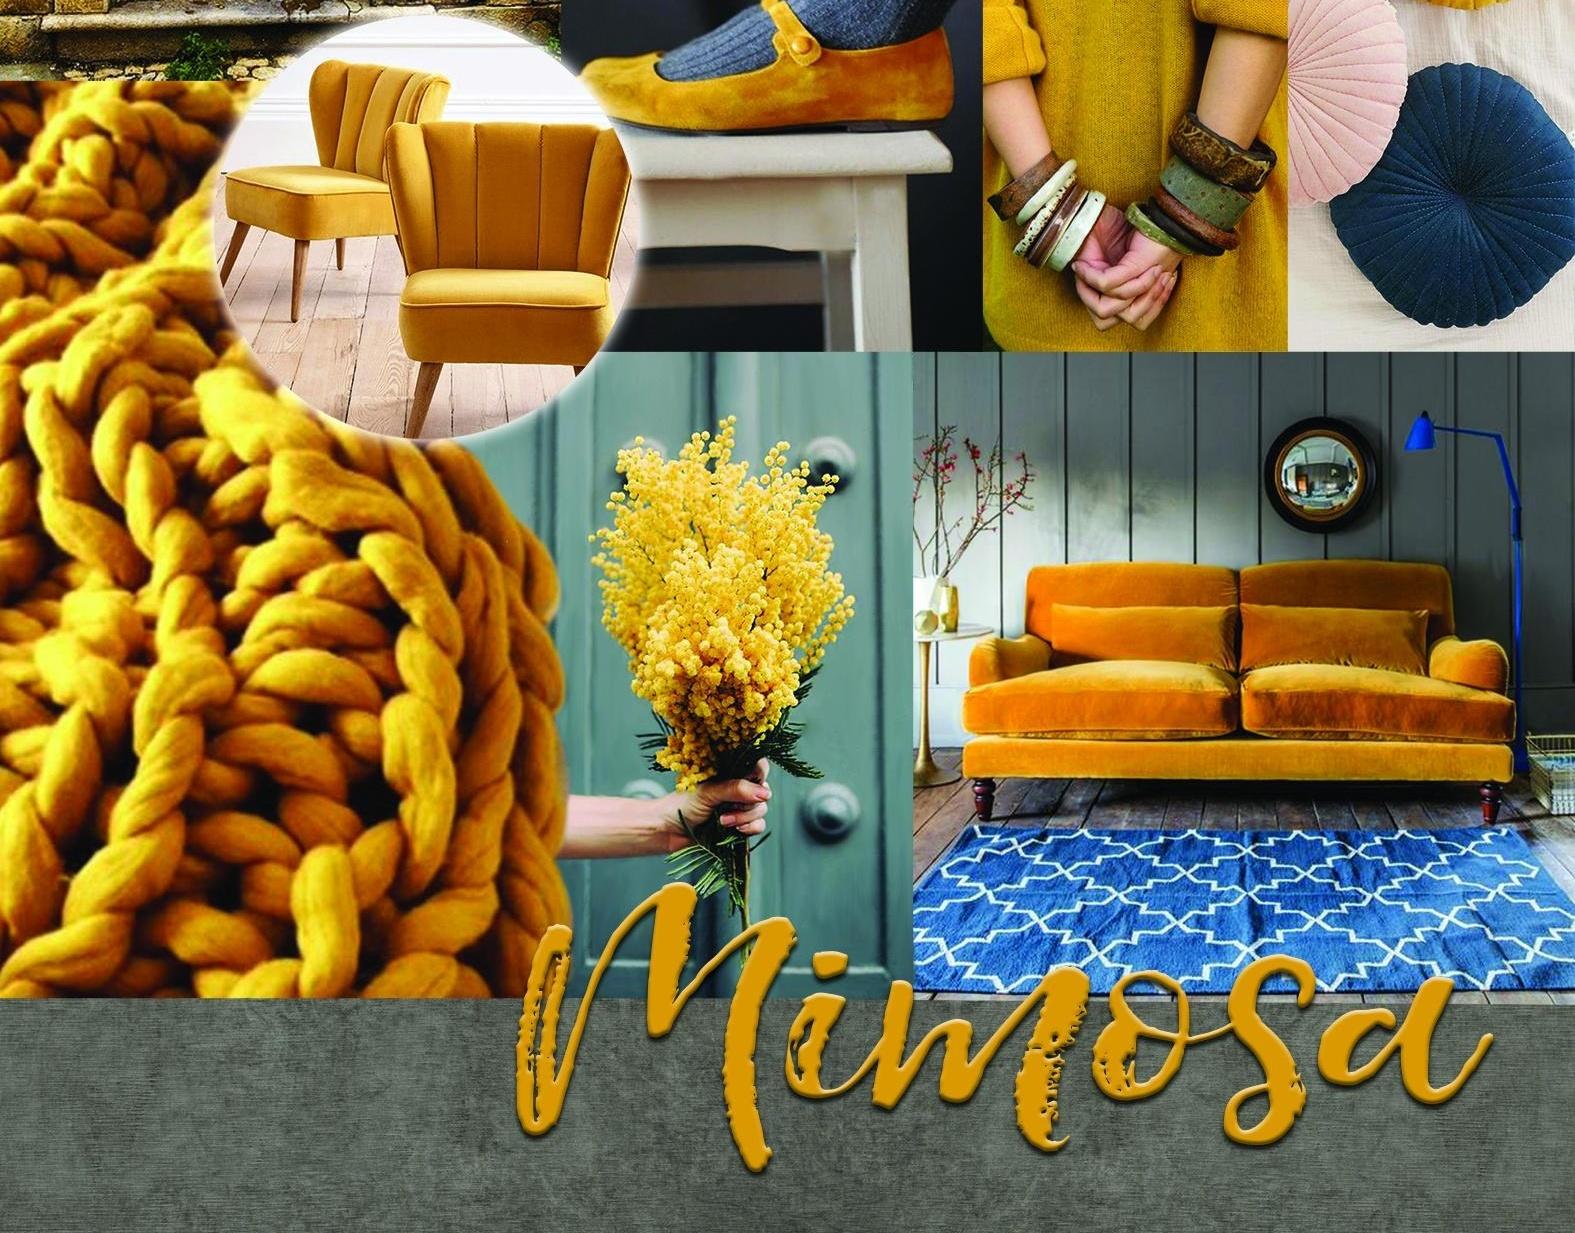 MIMOSA-2-175932-edited